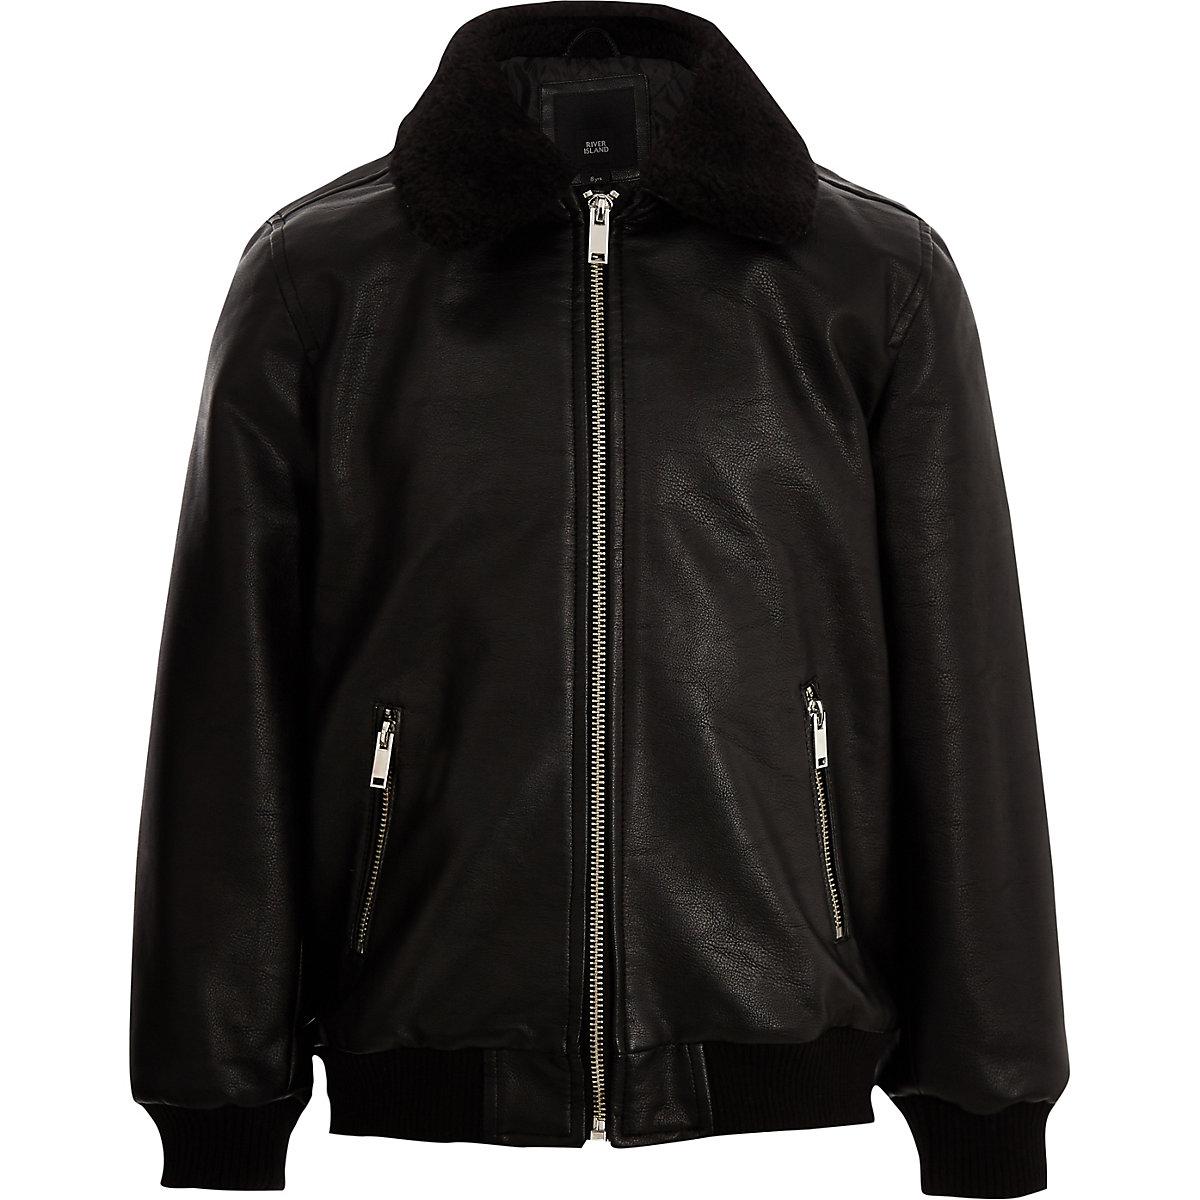 Boys black faux leather fleece collar jacket